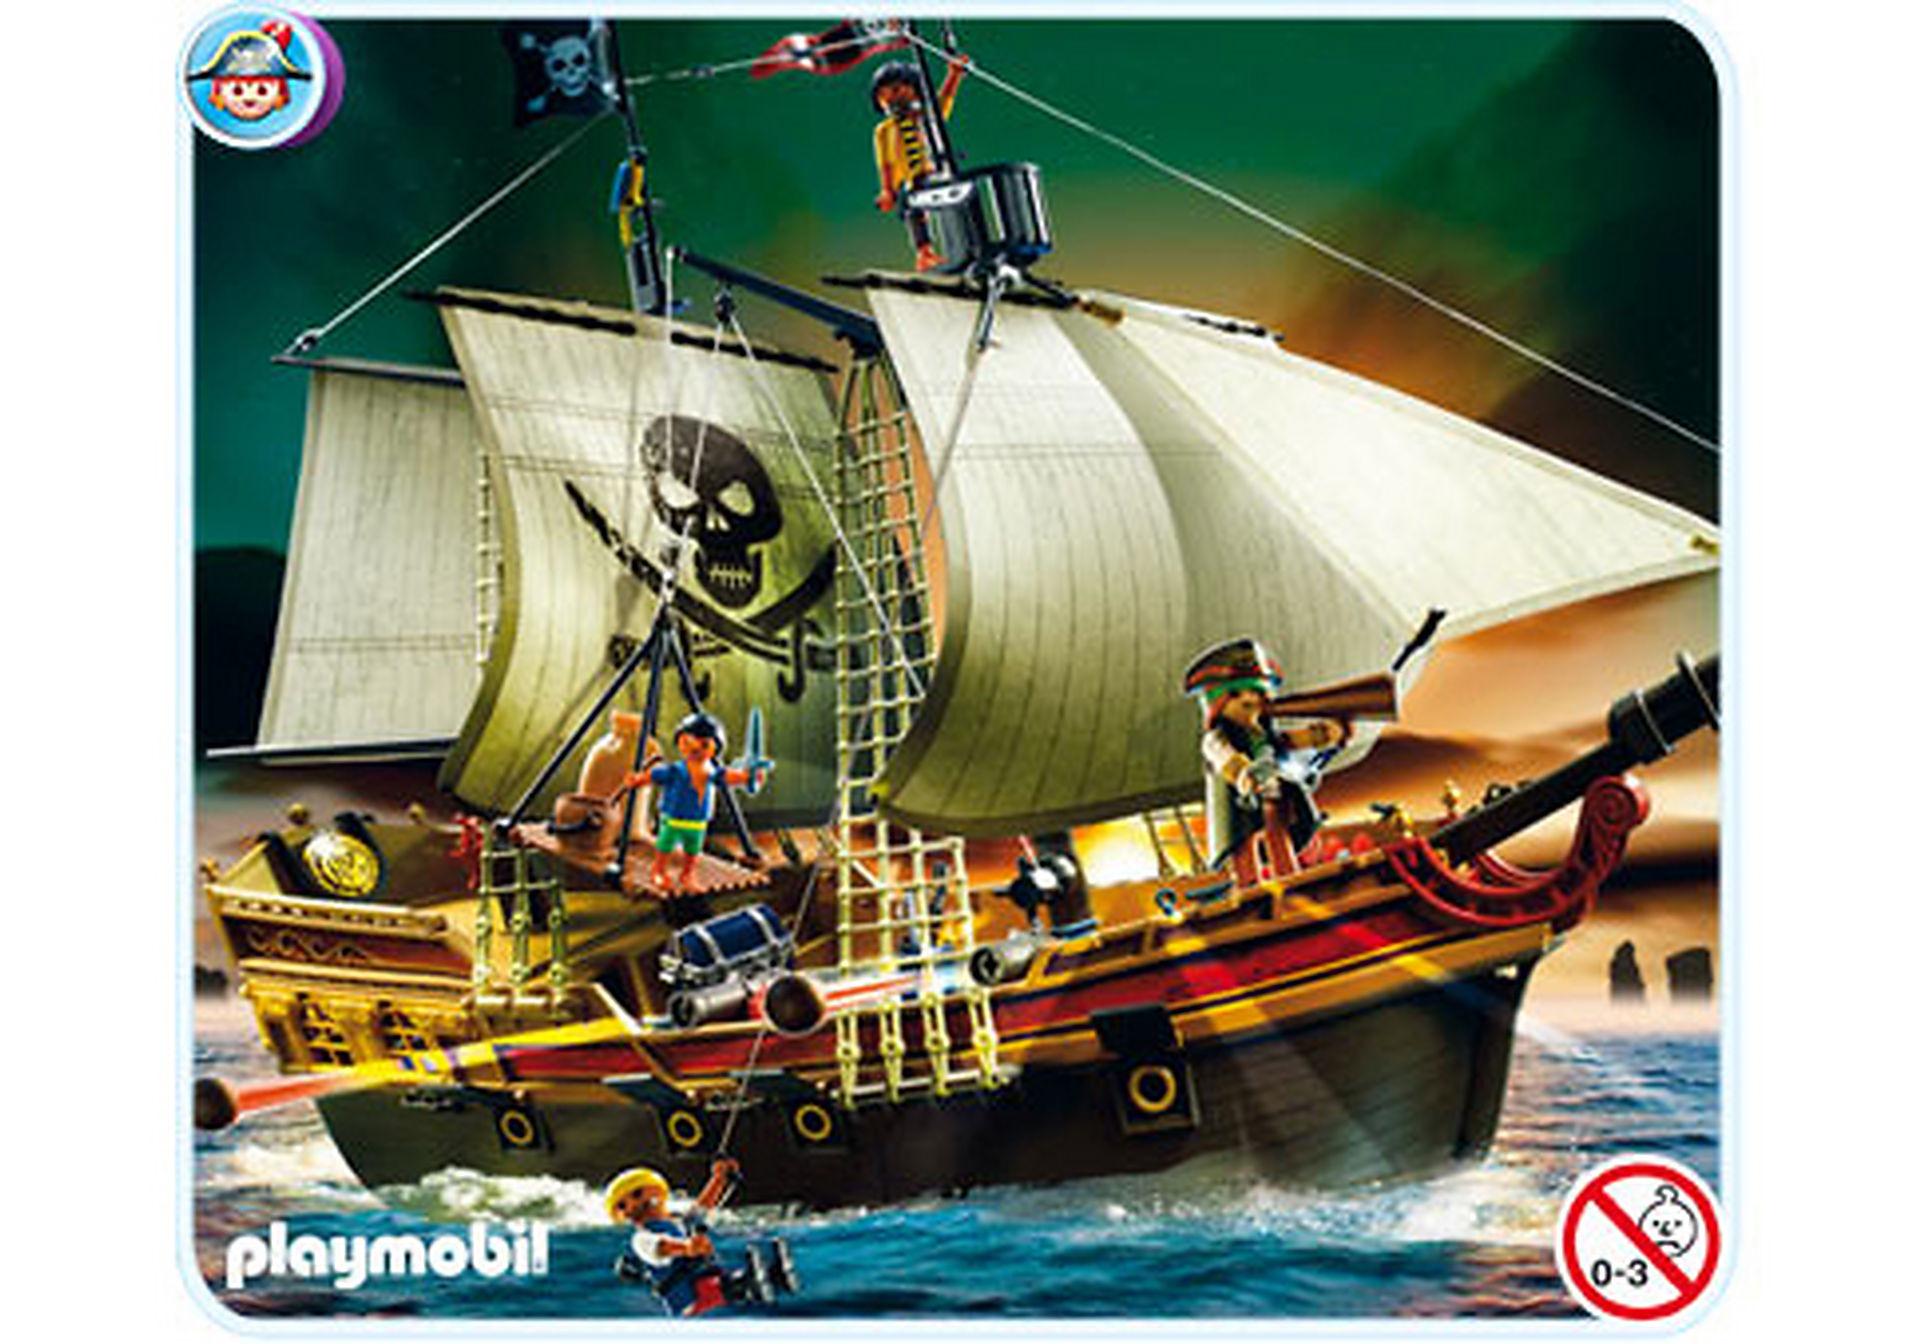 5135-A Piraten-Beuteschiff zoom image1